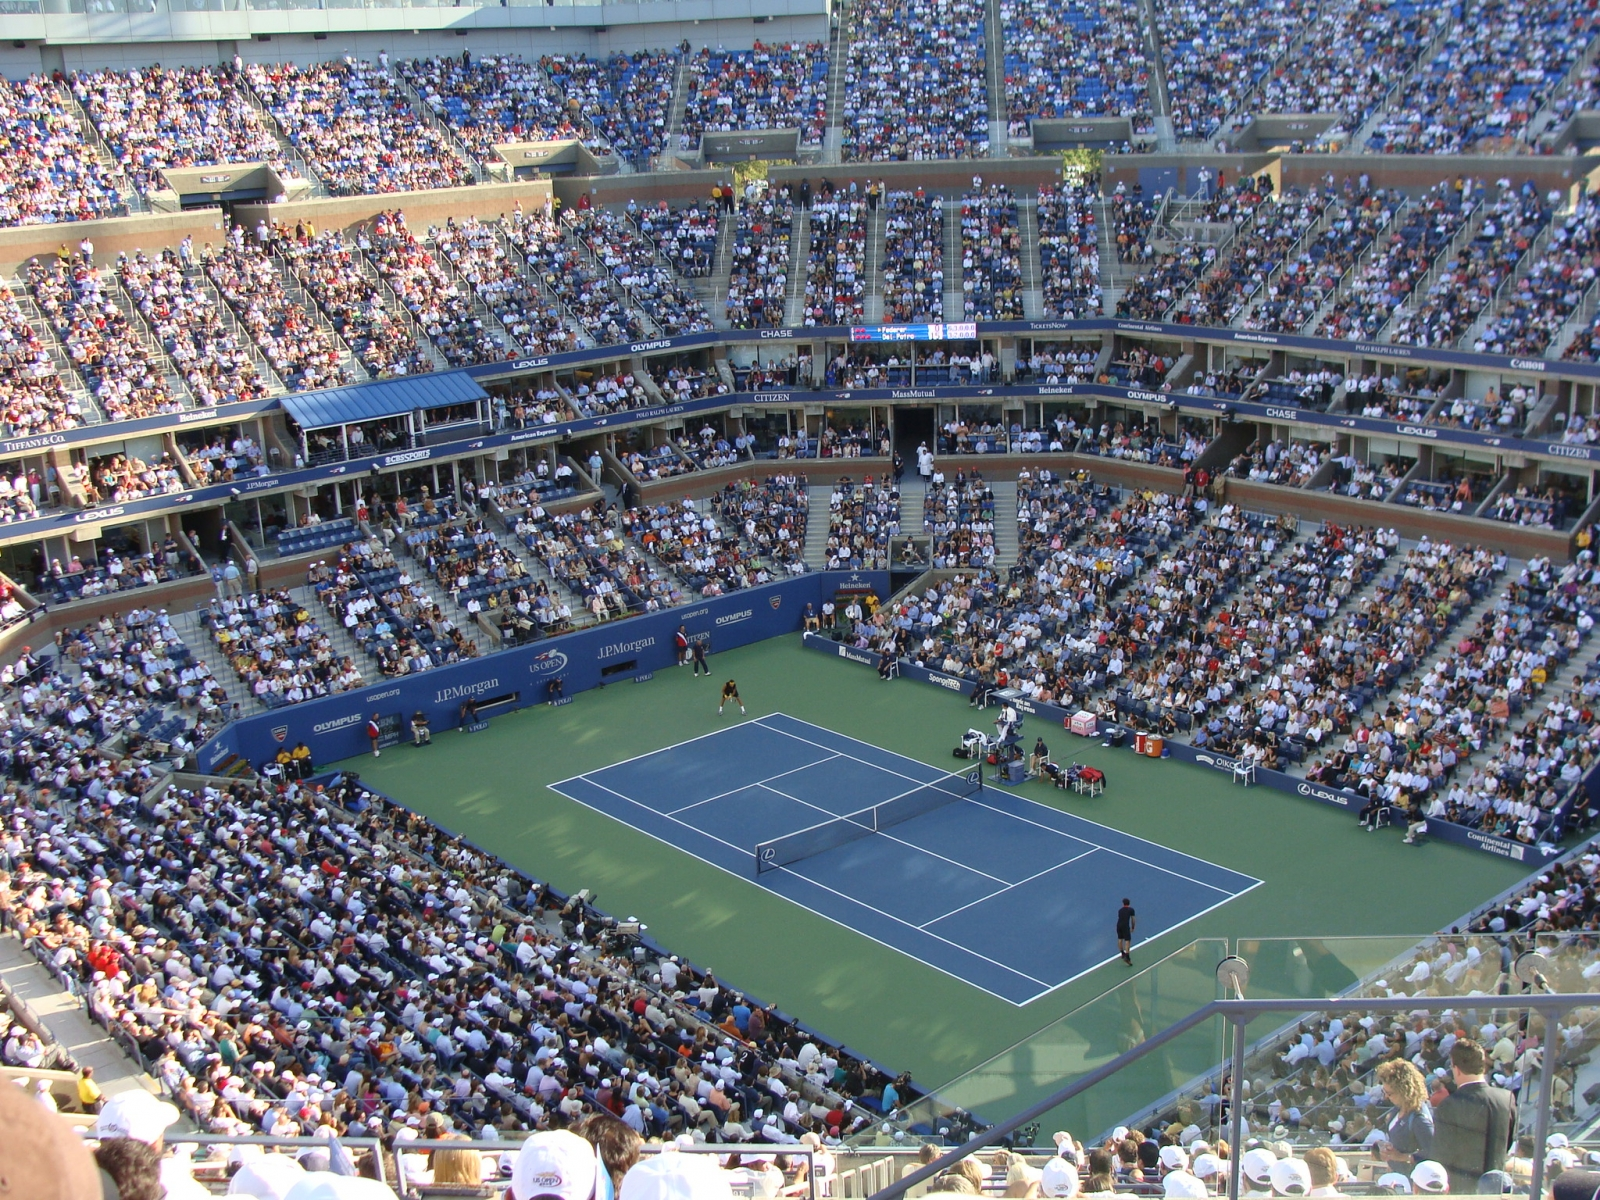 36_Delpo vs Federer 2009